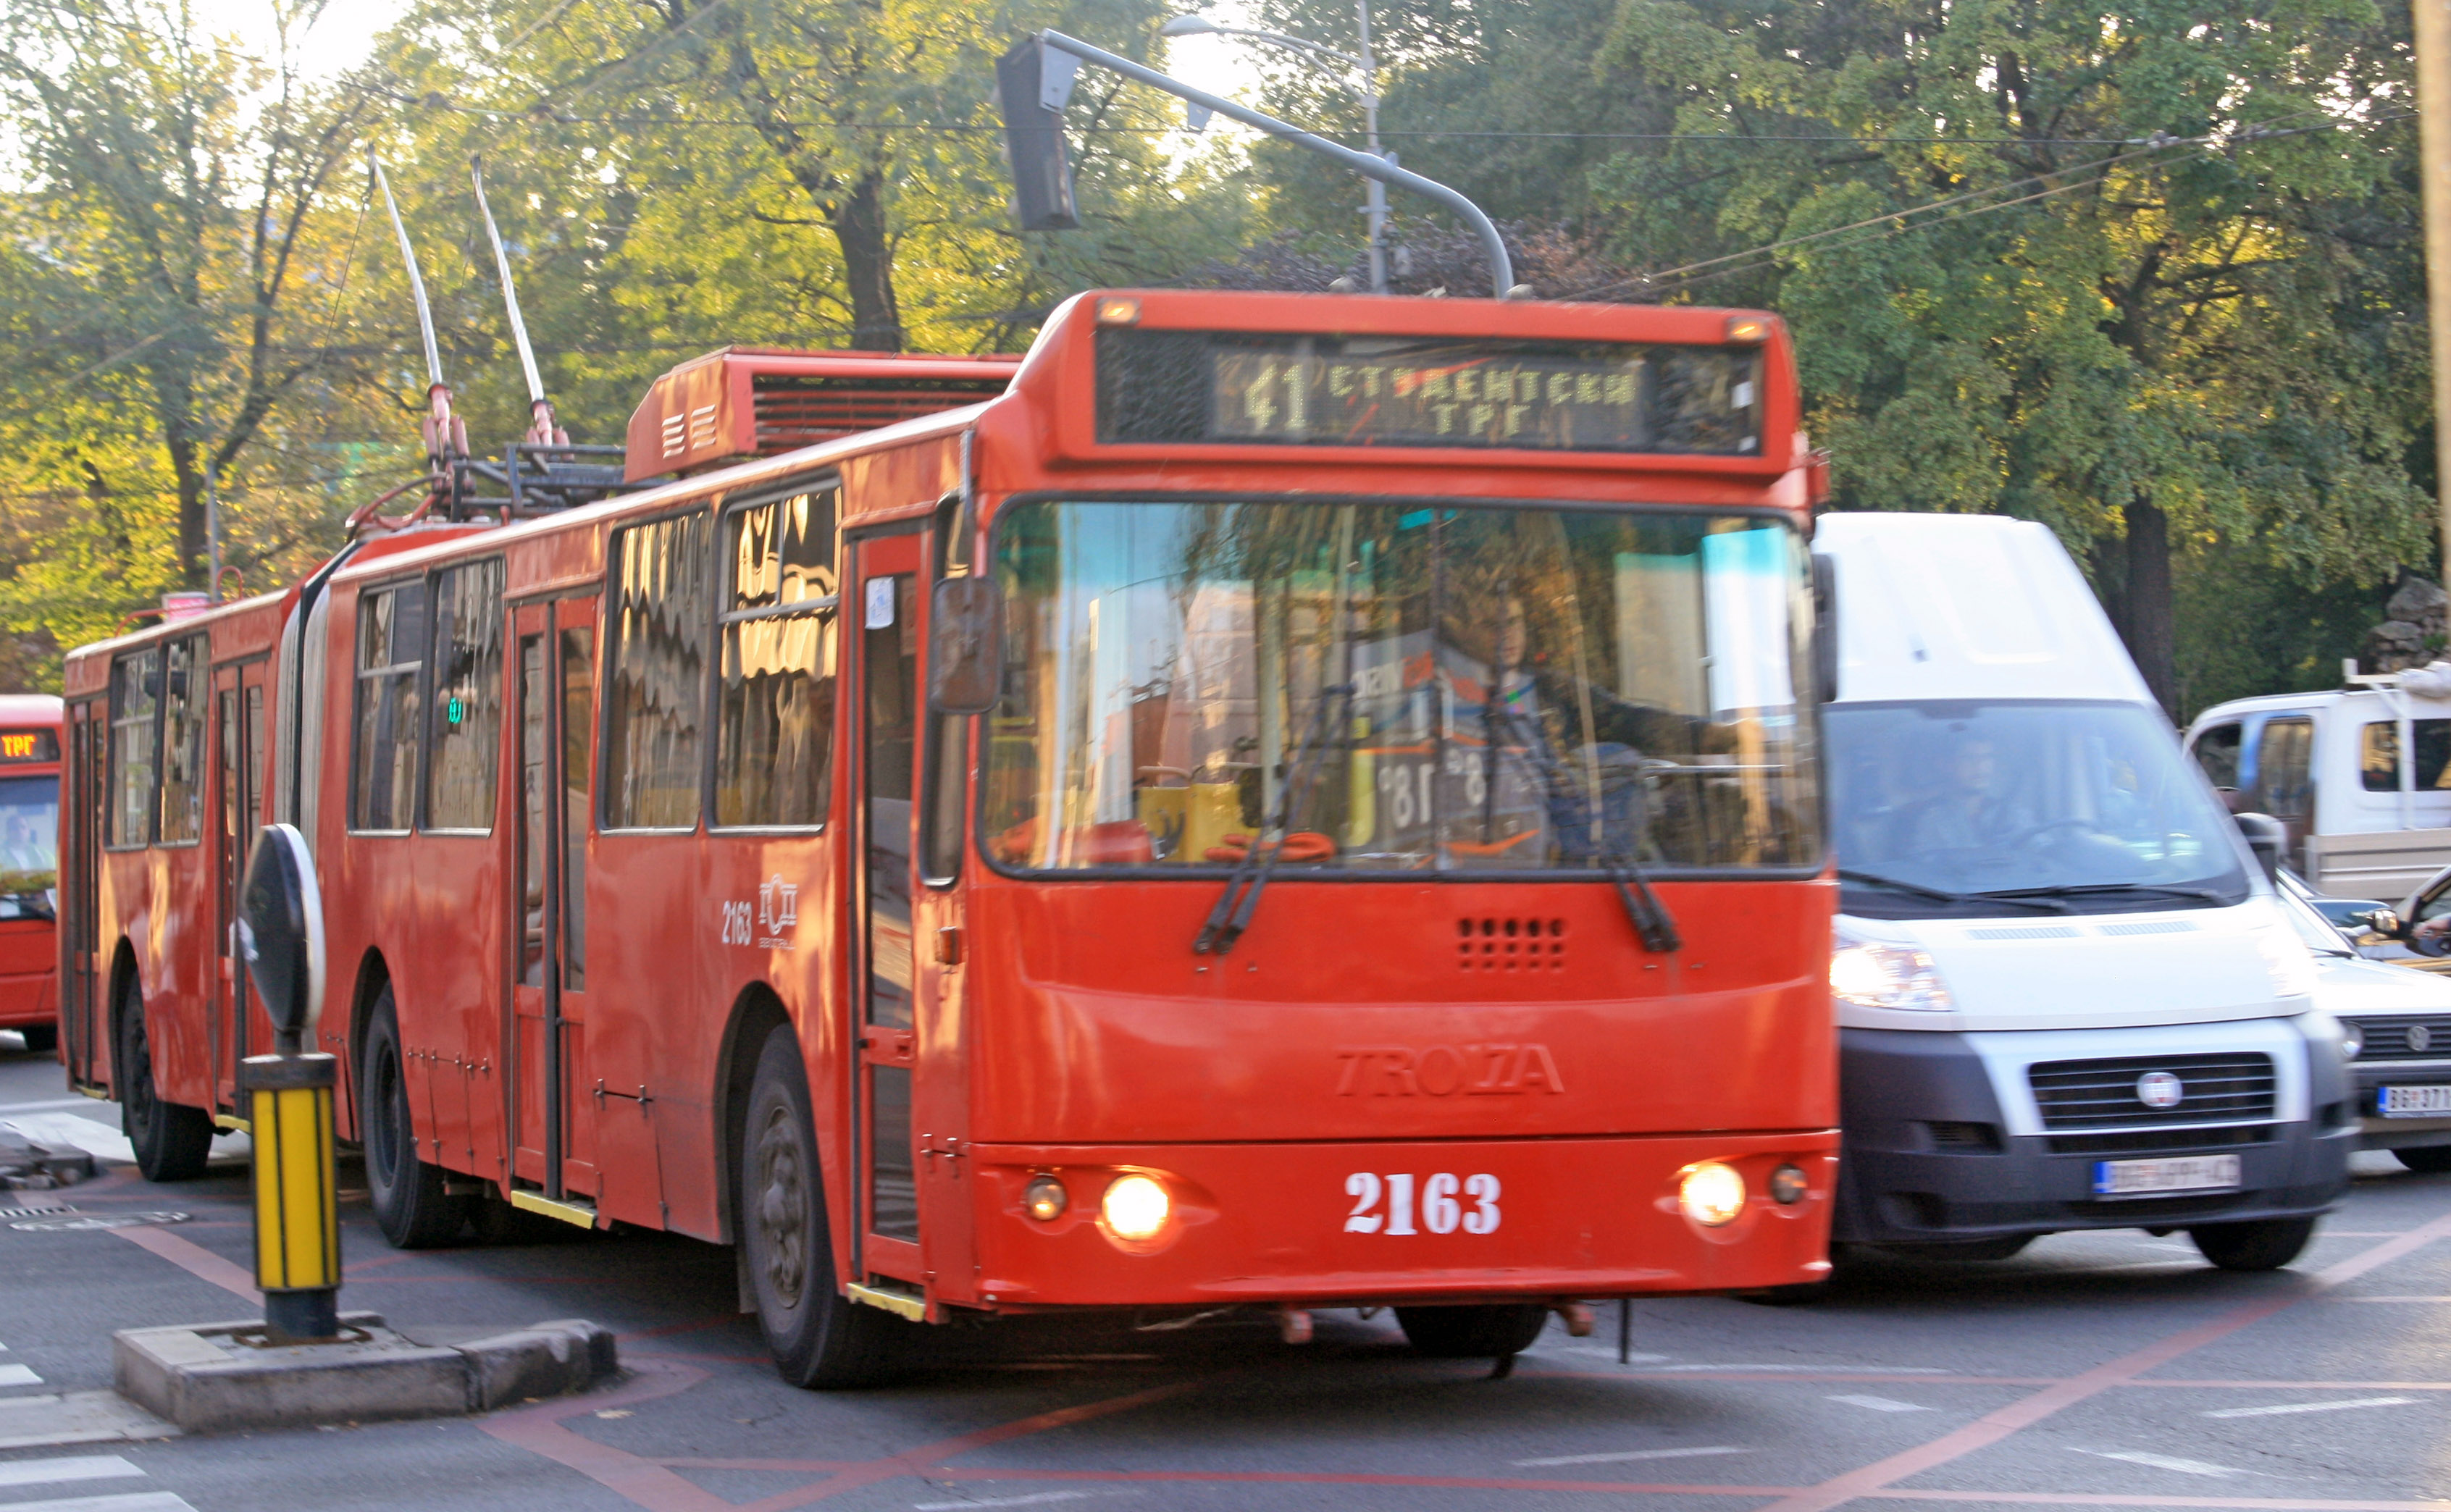 File:TrolZa GSP Beograd 2163.jpg